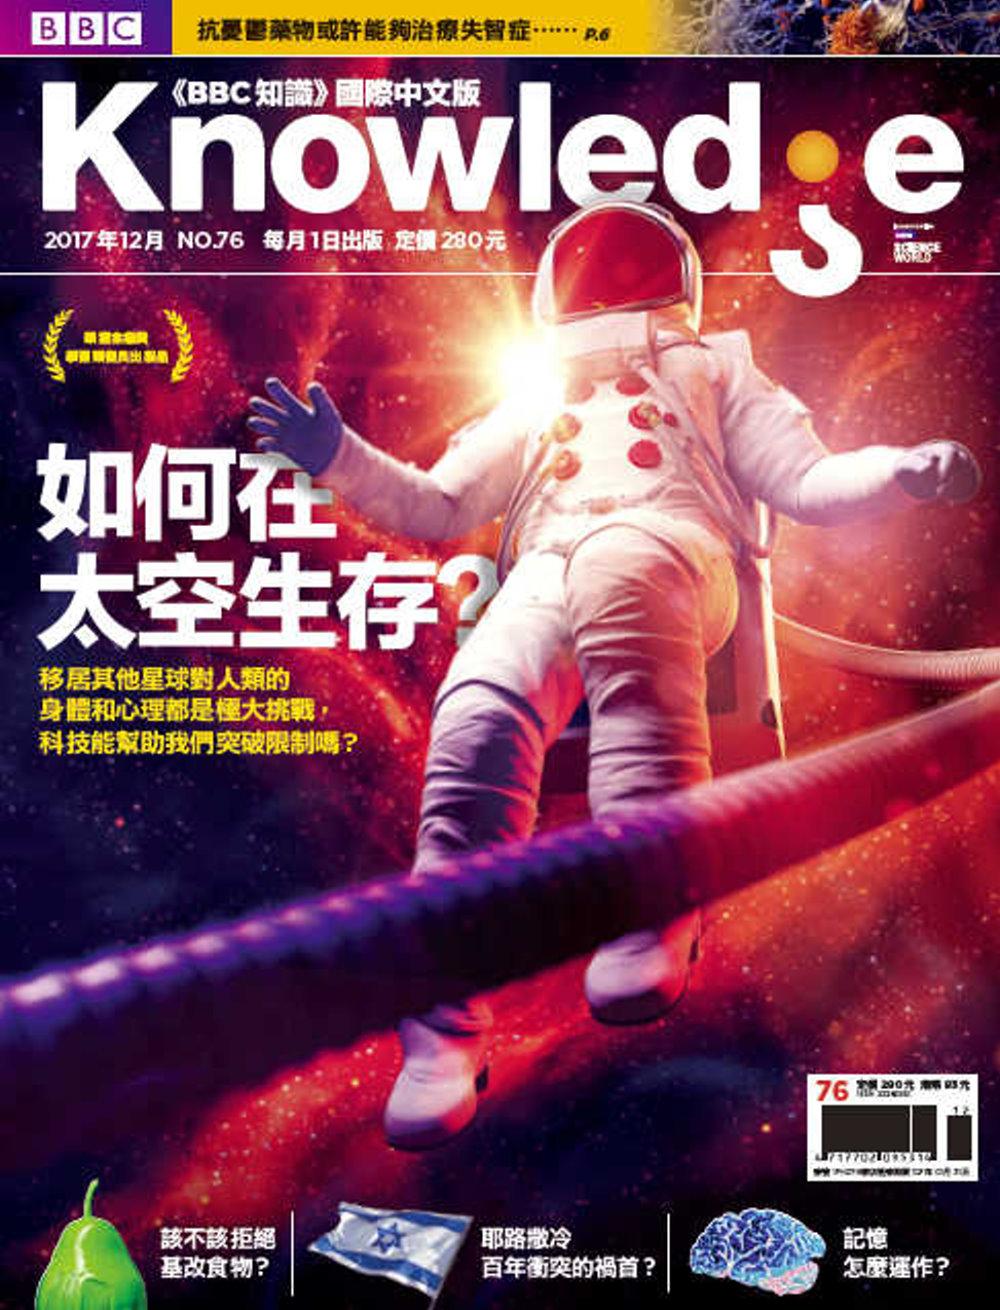 BBC Knowledge 國際中文版 12月號 2017 第76期